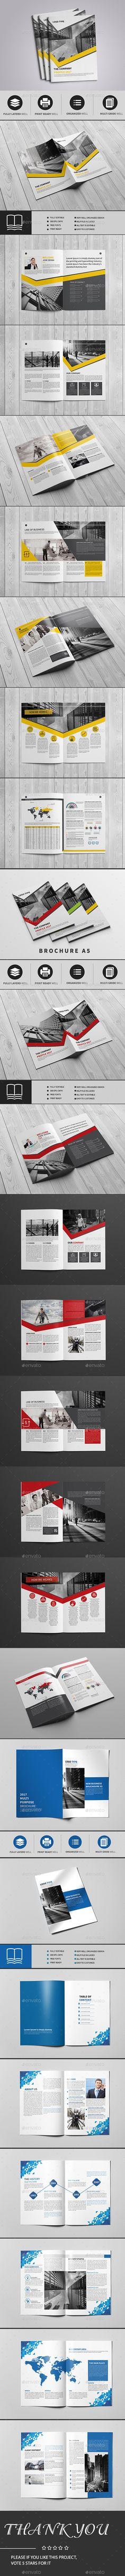 Brochure Bundle 3x1 — InDesign INDD #advertise #psd brochure • Download ➝ https://graphicriver.net/item/brochure-bundle-3x1/19130903?ref=pxcr